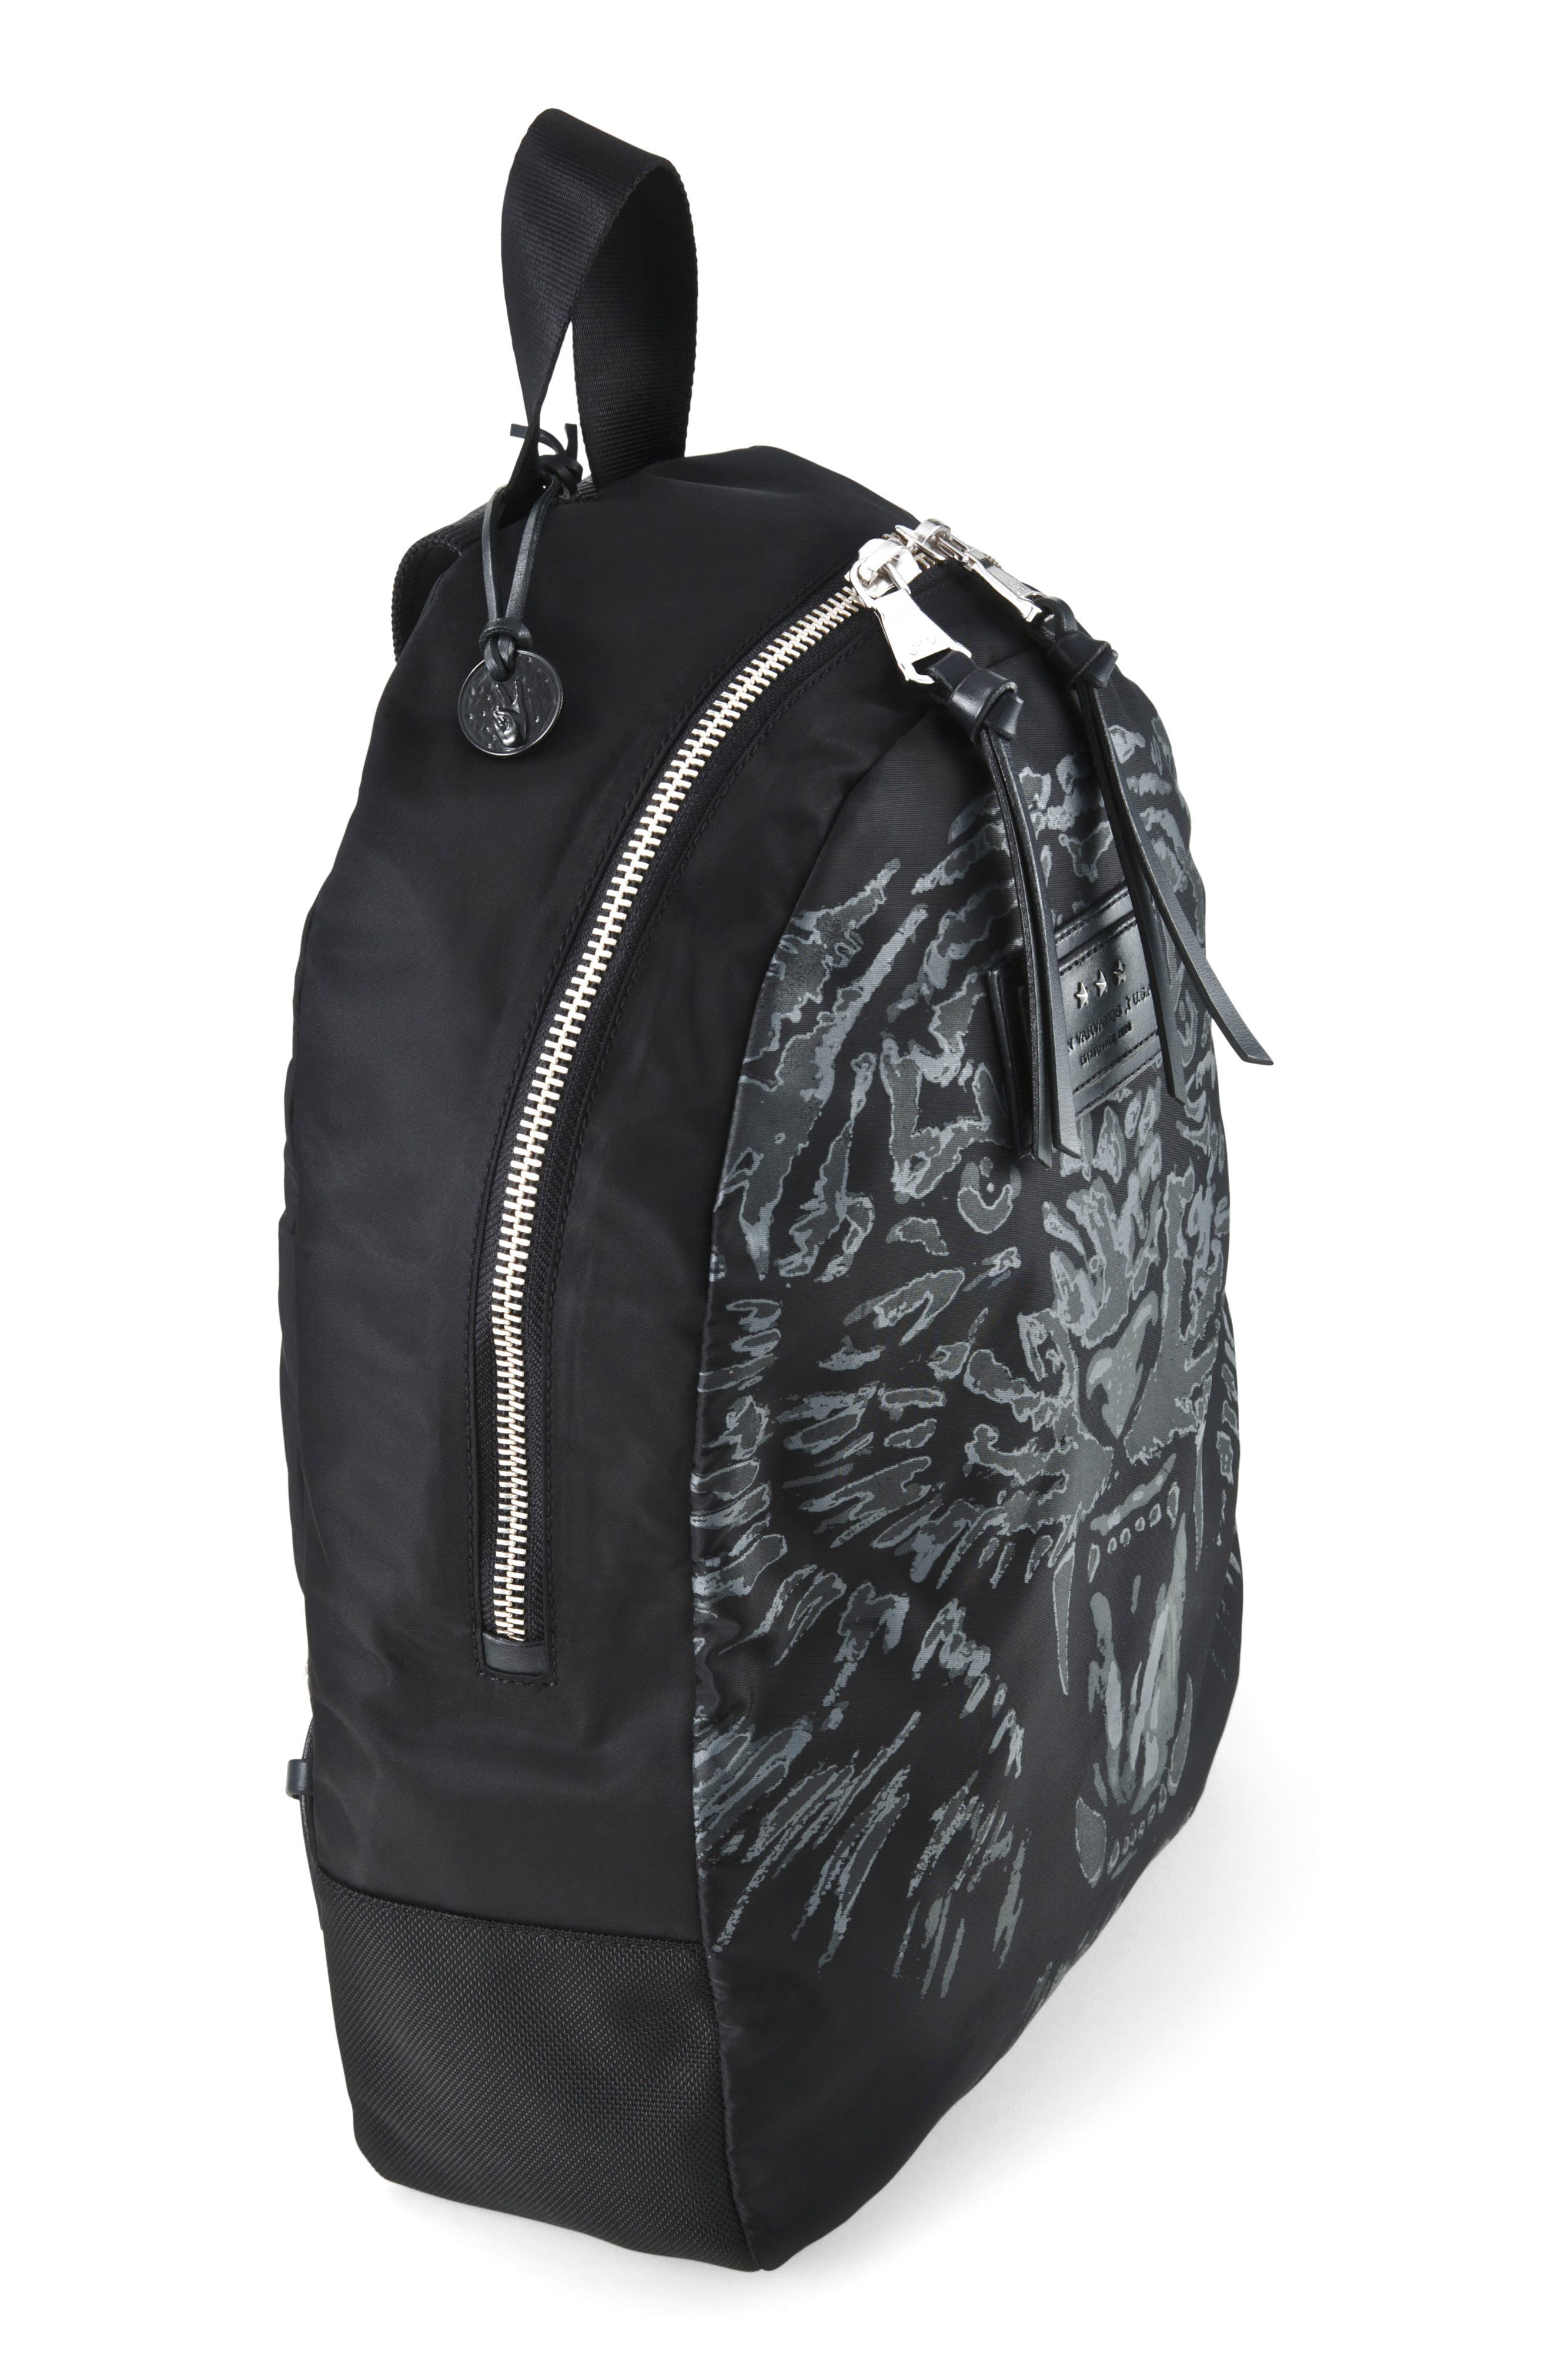 Tiger Print Backpack,                             Alternate thumbnail 2, color,                             Black